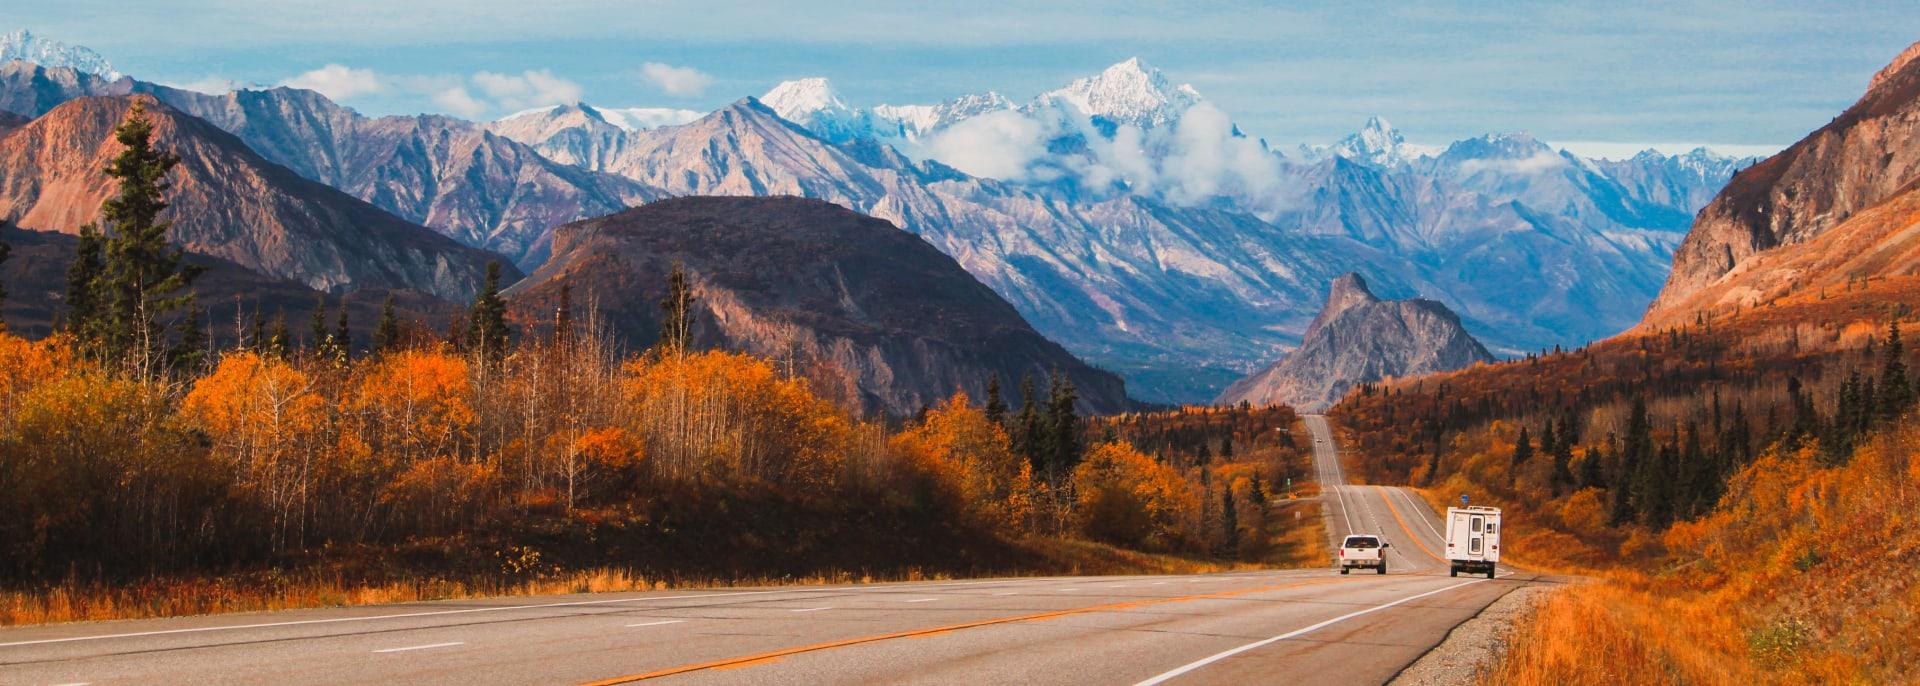 Strasse, Alaska